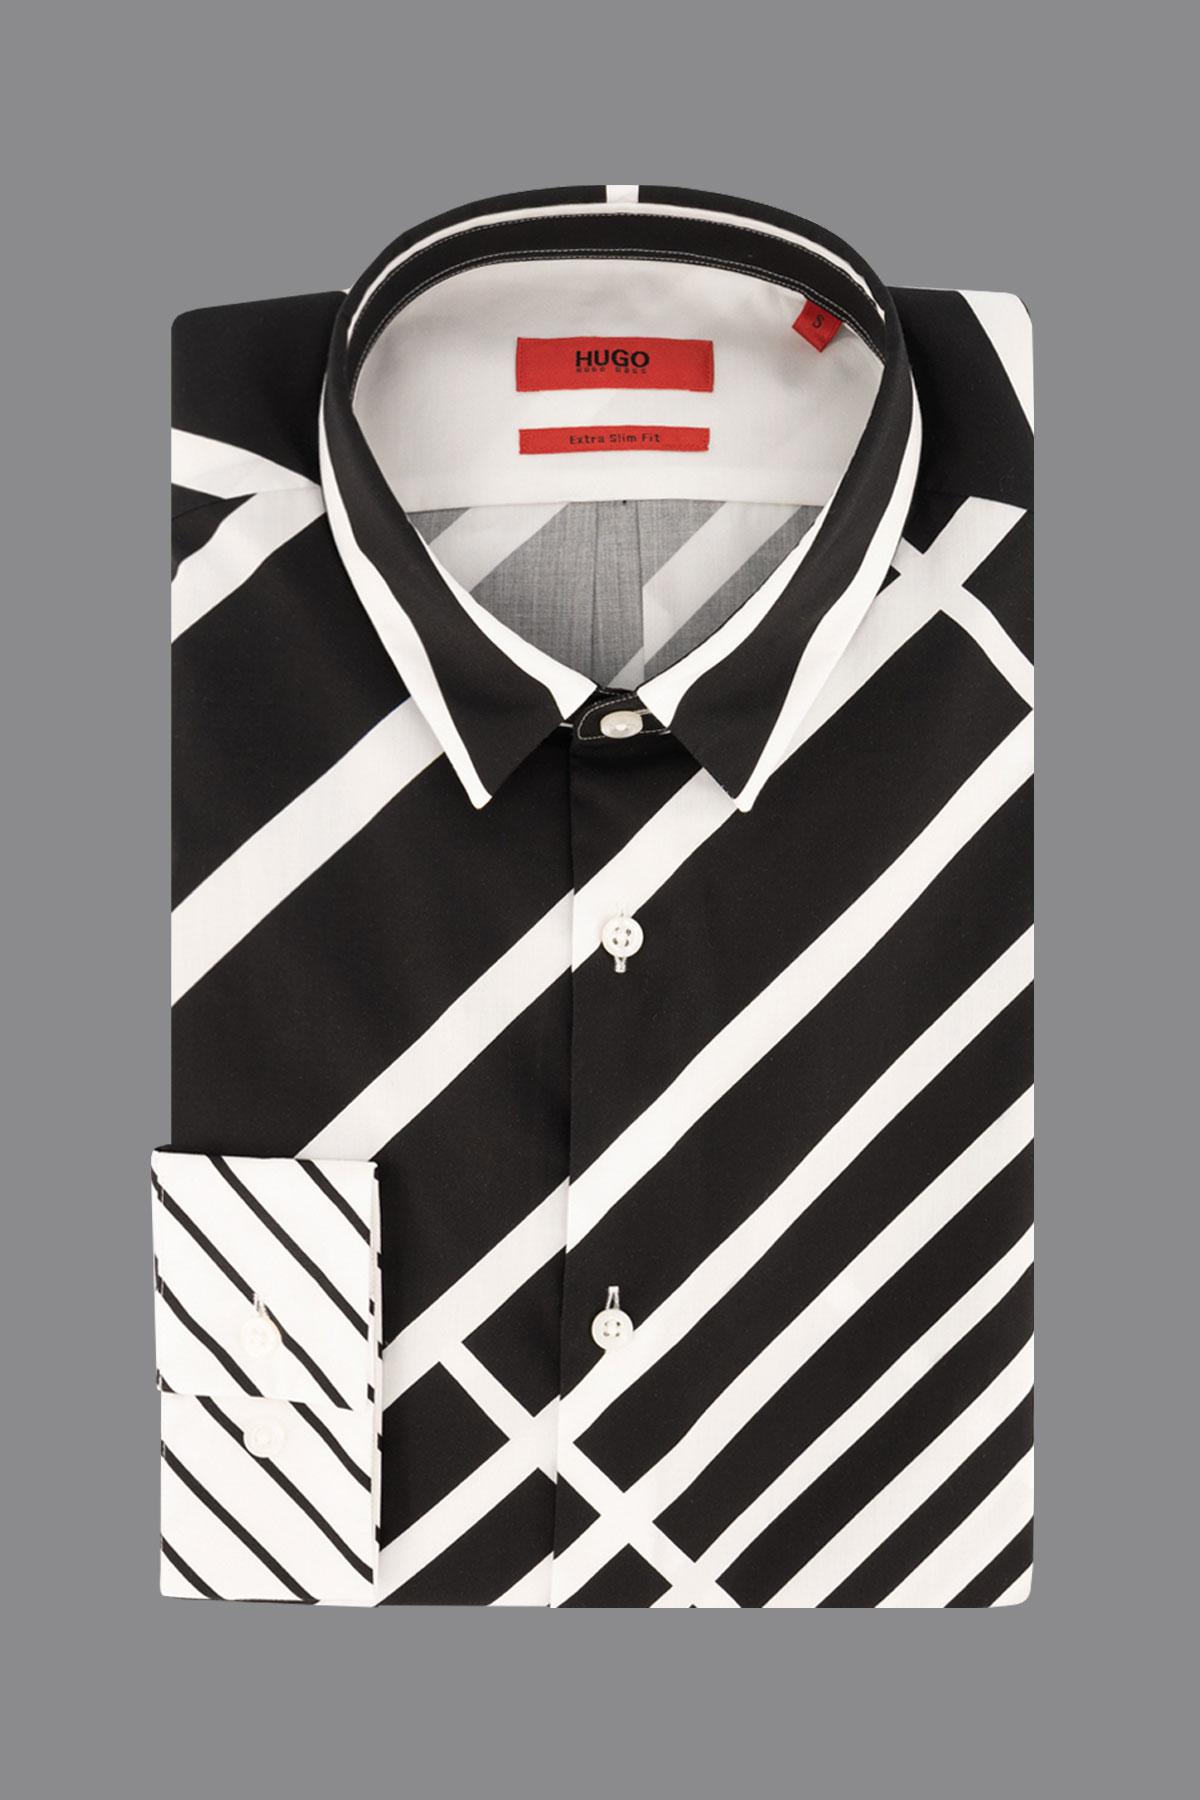 Camisa Hugo rayas diagonal